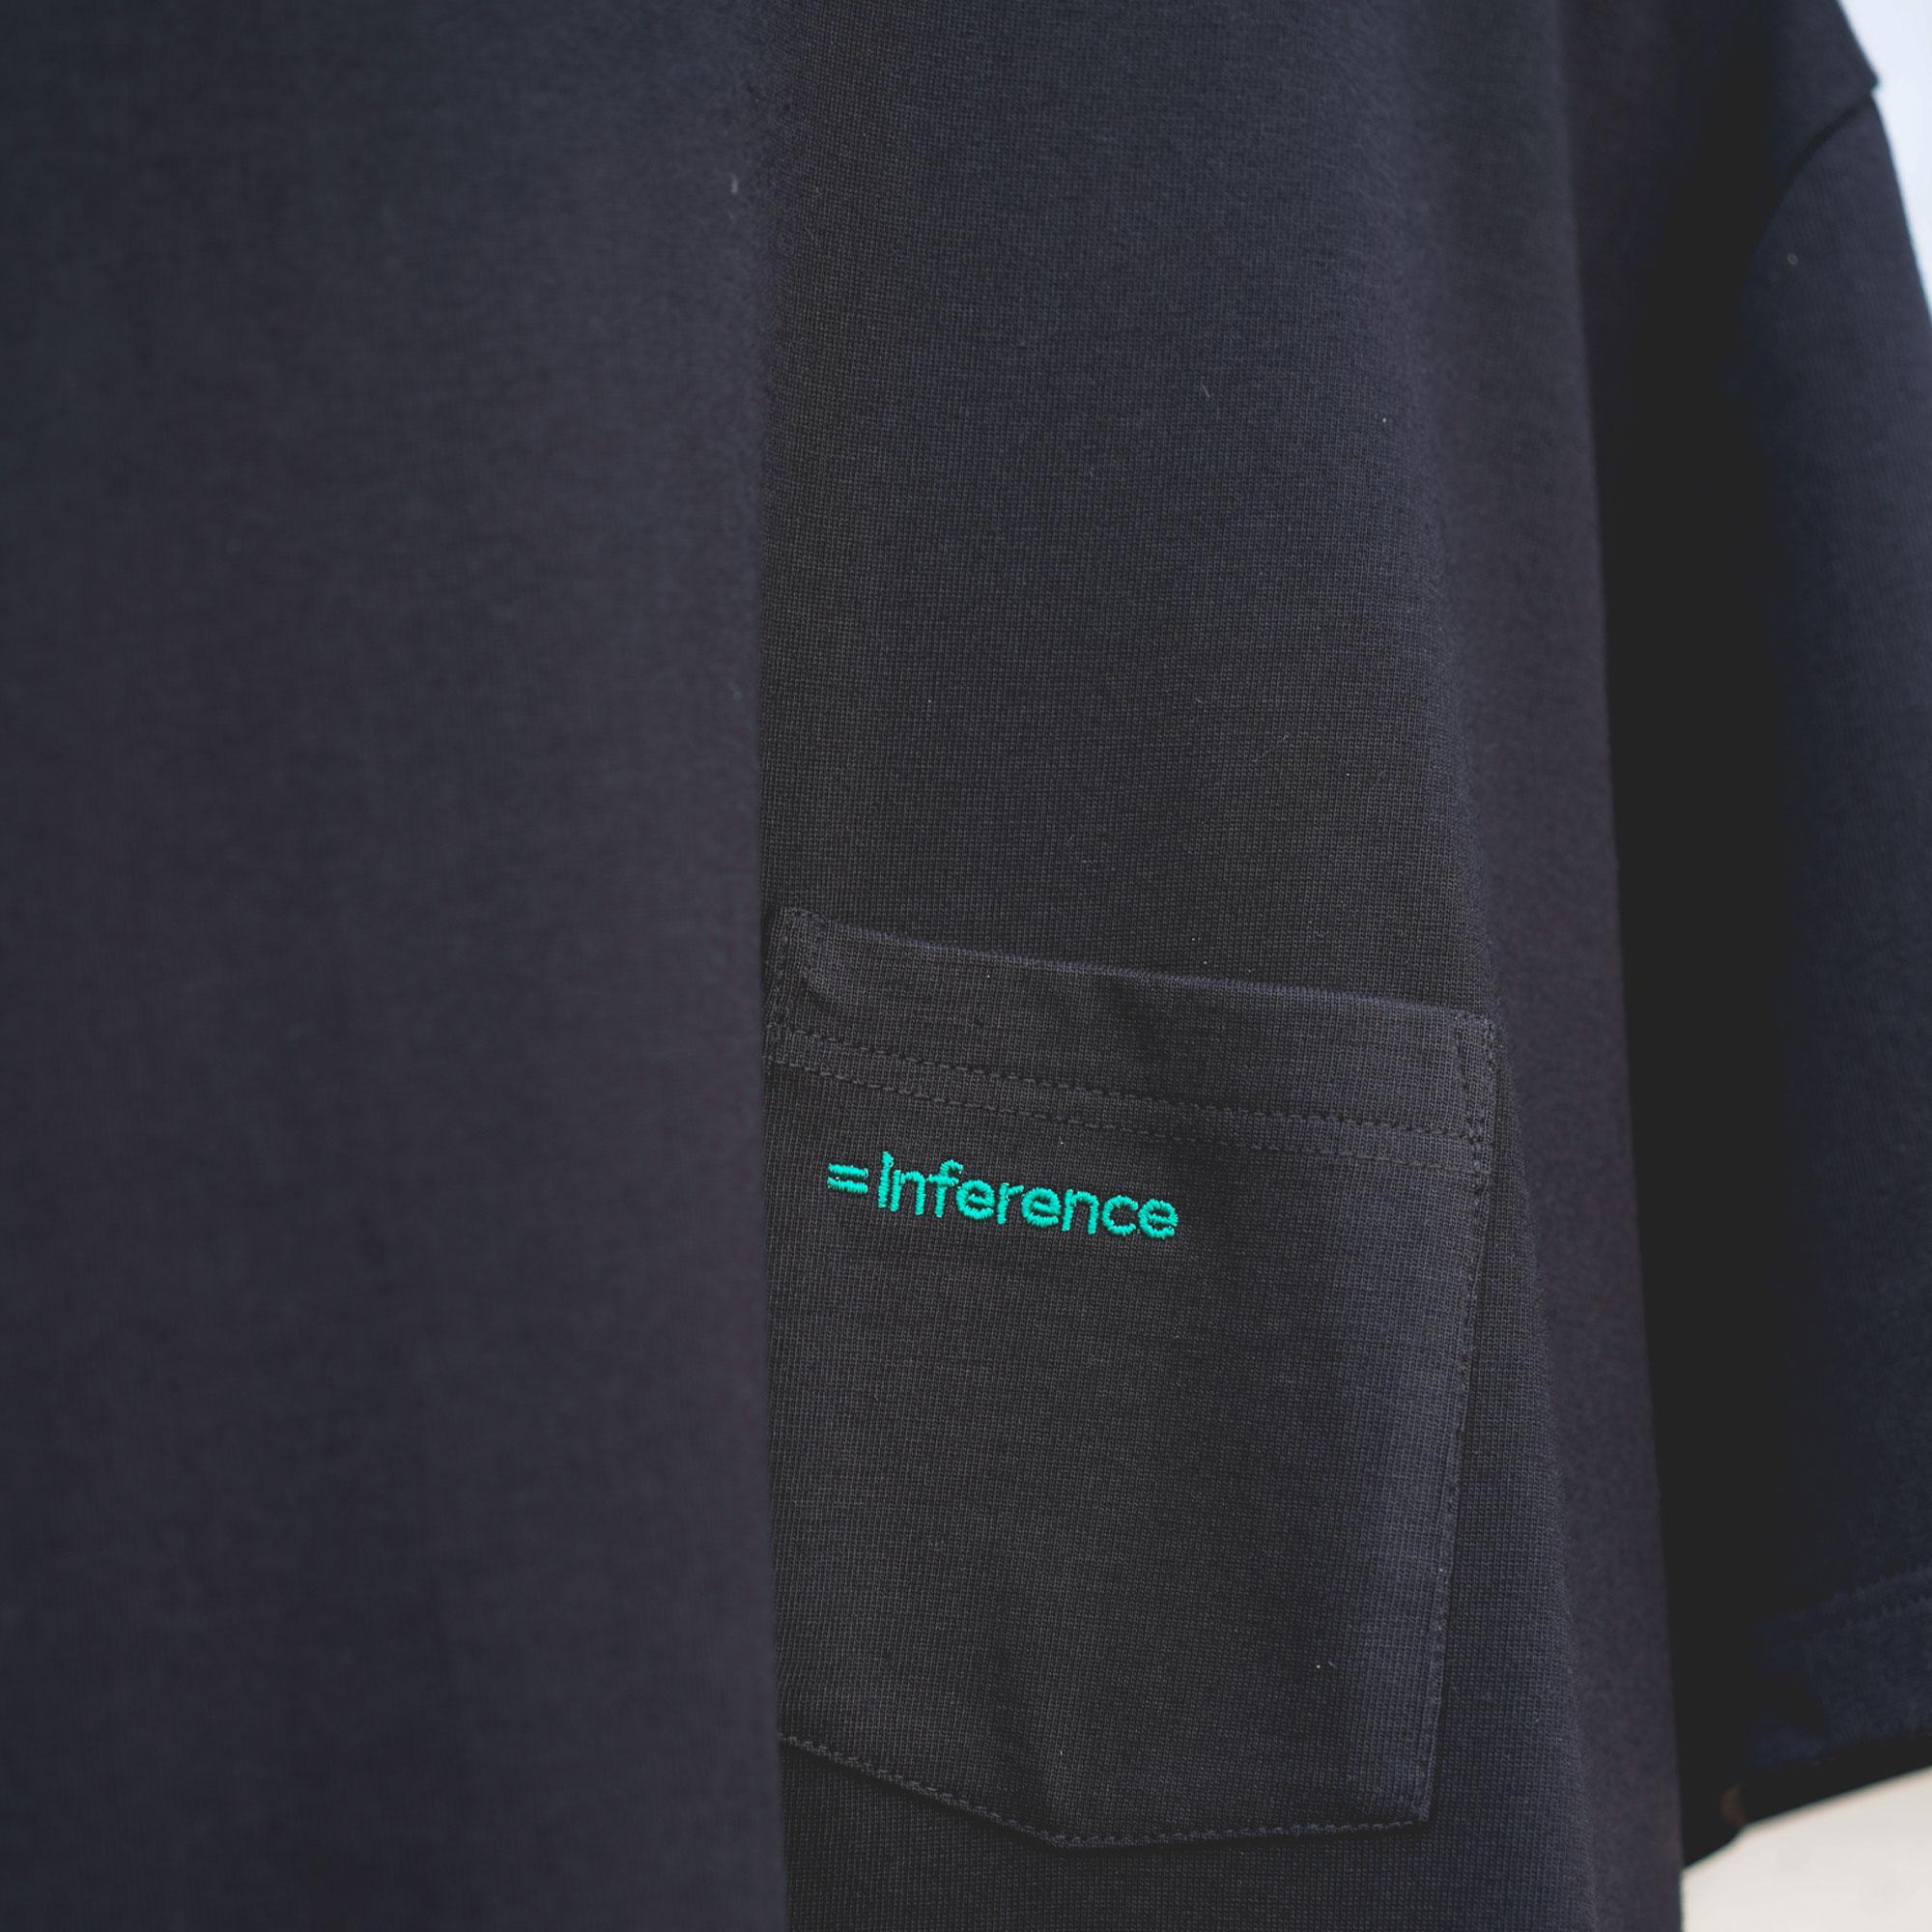 Inference_Pocket_007-1_003